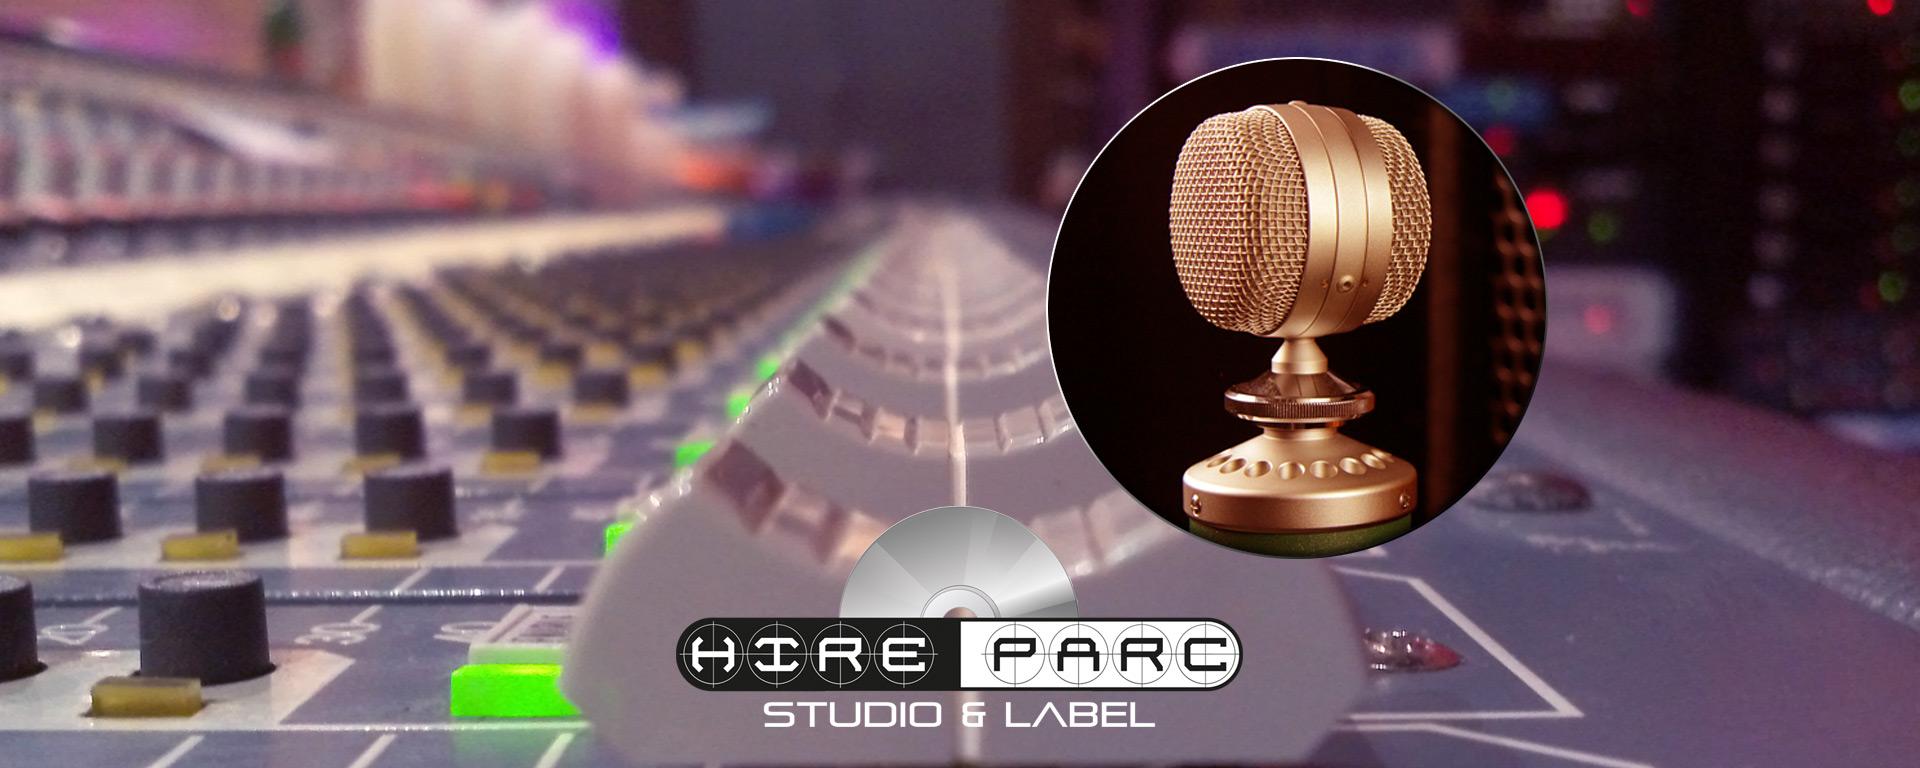 HIRE-PARC studios